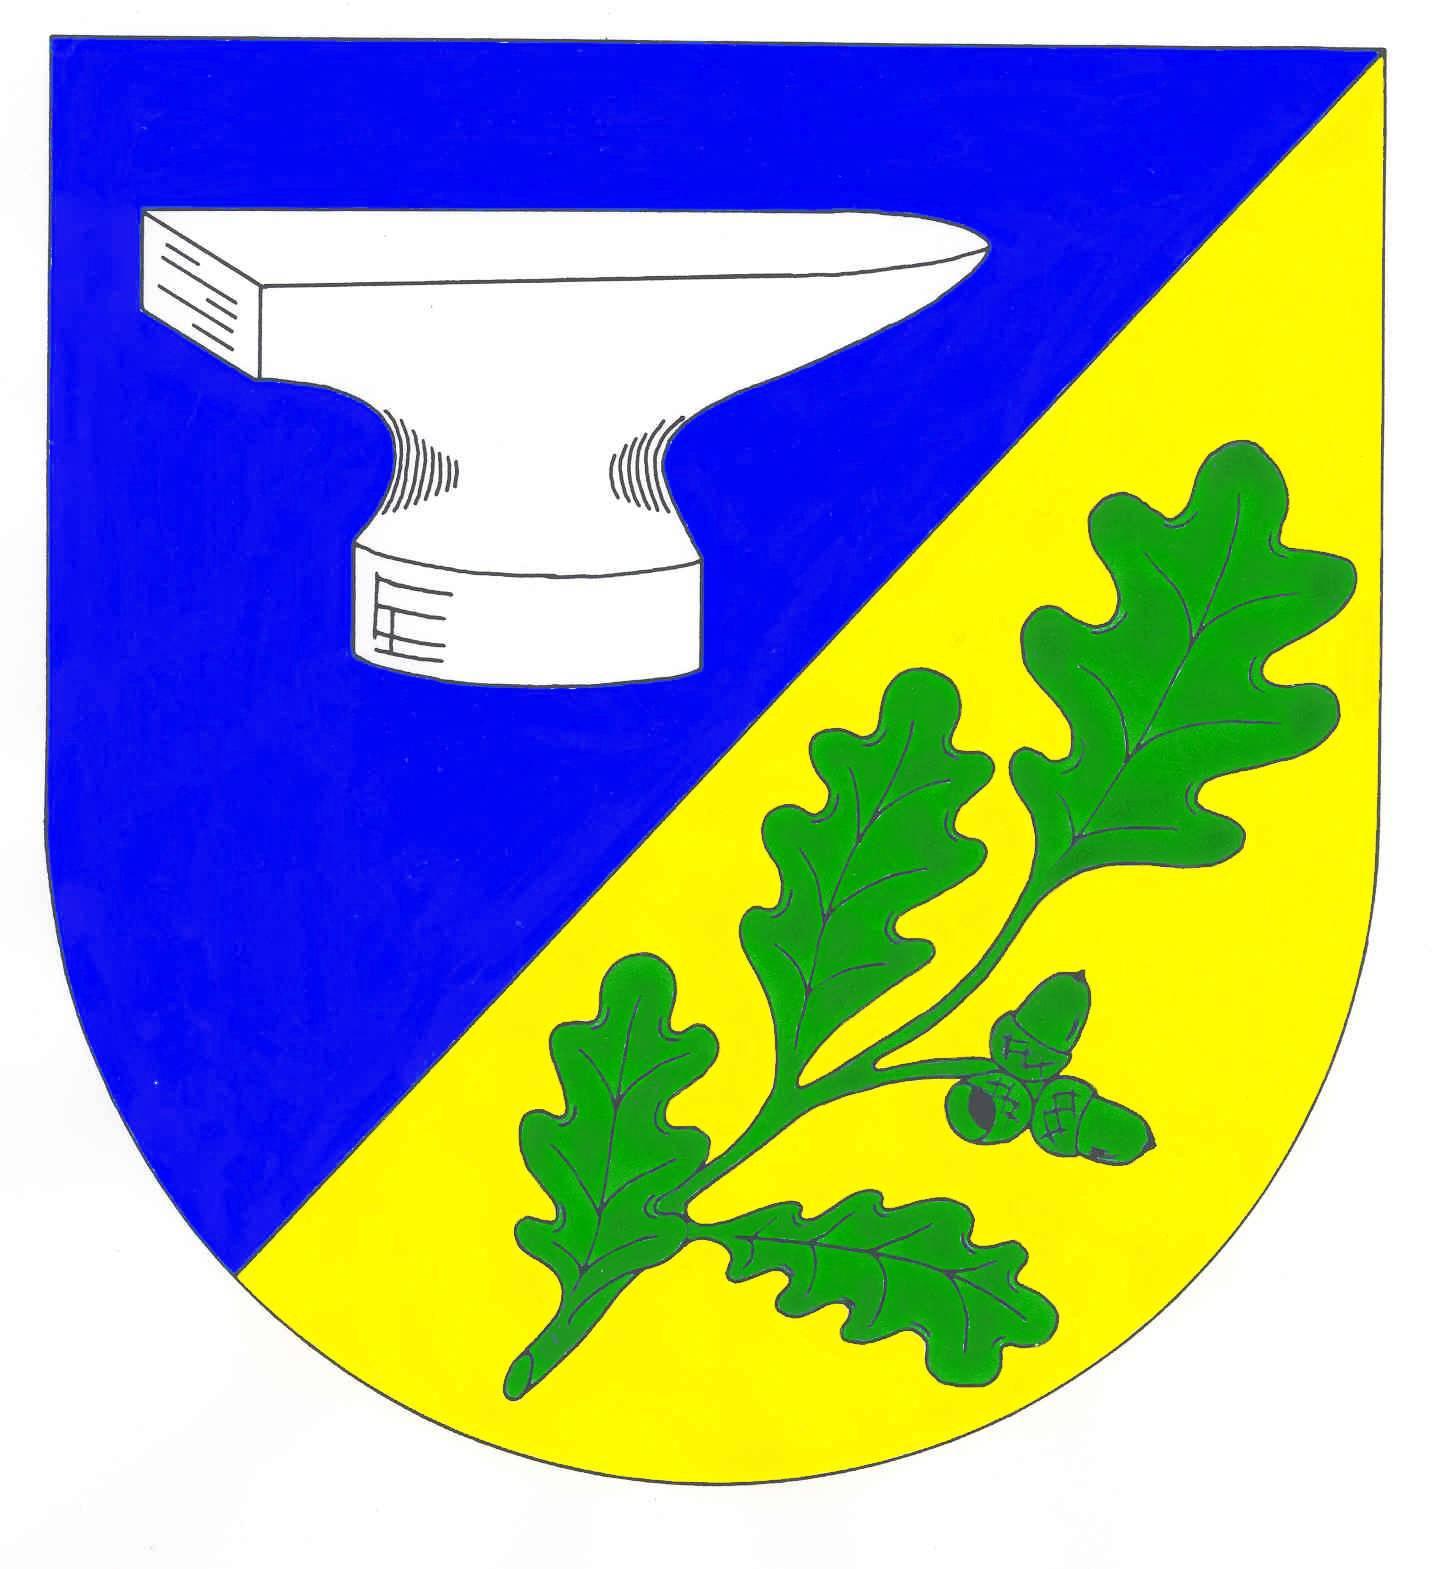 Wappen GemeindeJerrishoe, Kreis Schleswig-Flensburg